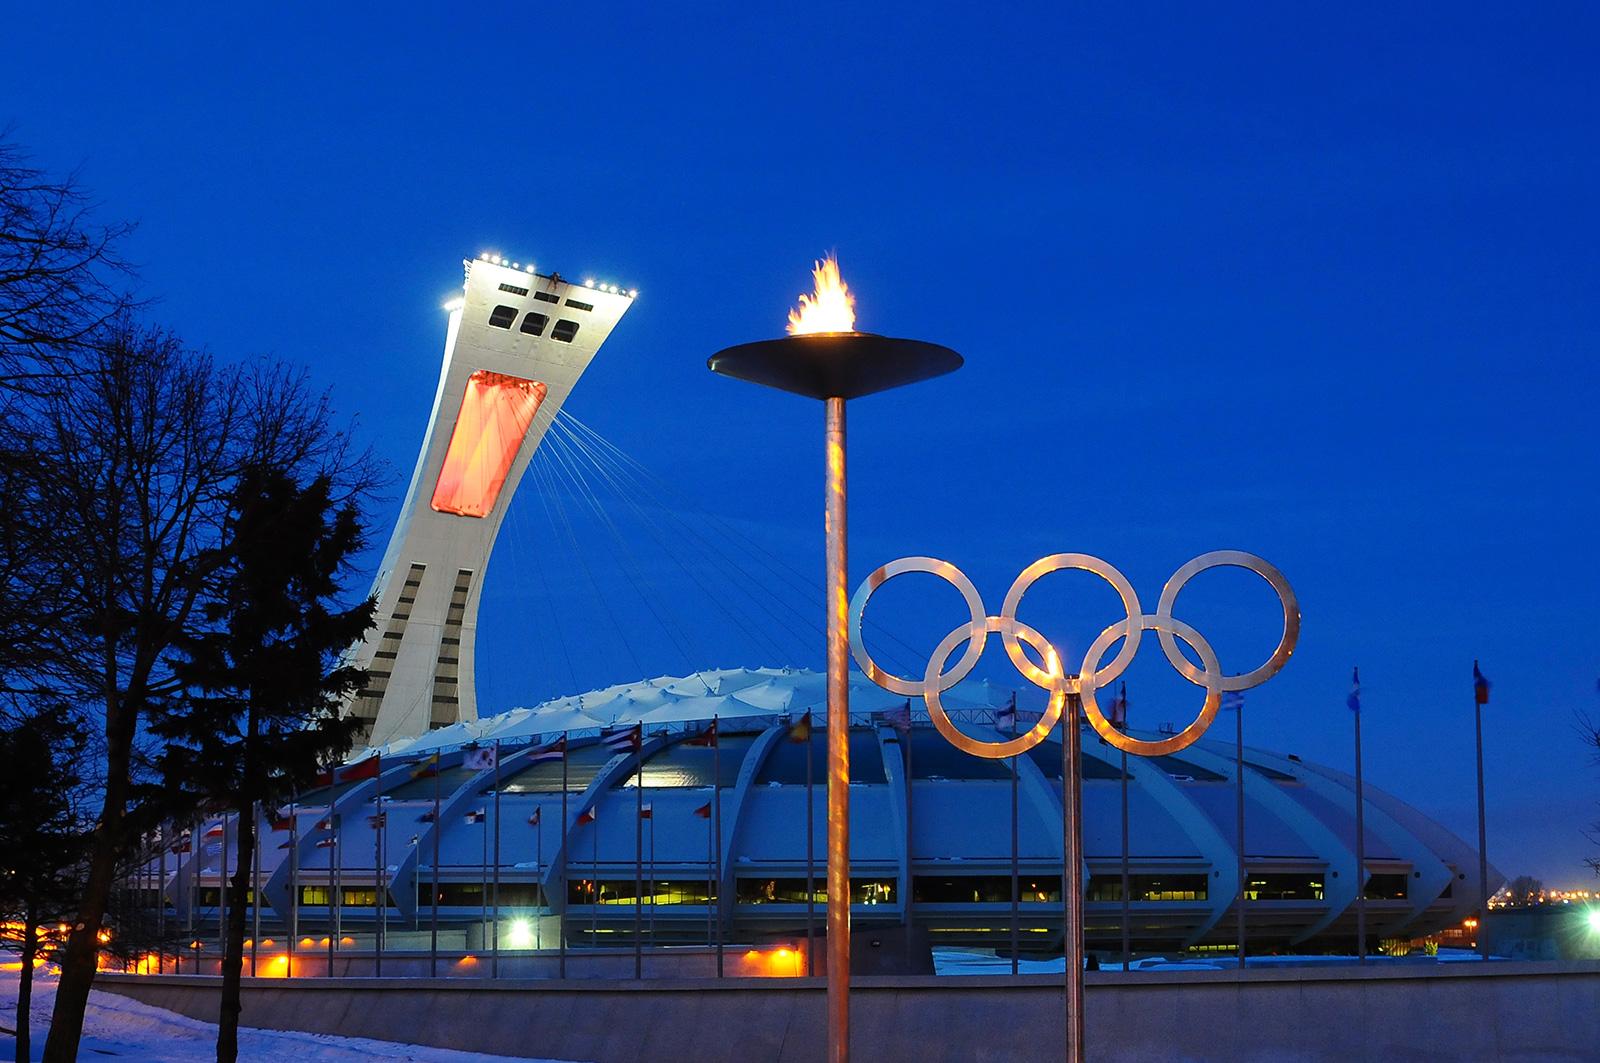 montreal-tower-and-stadium